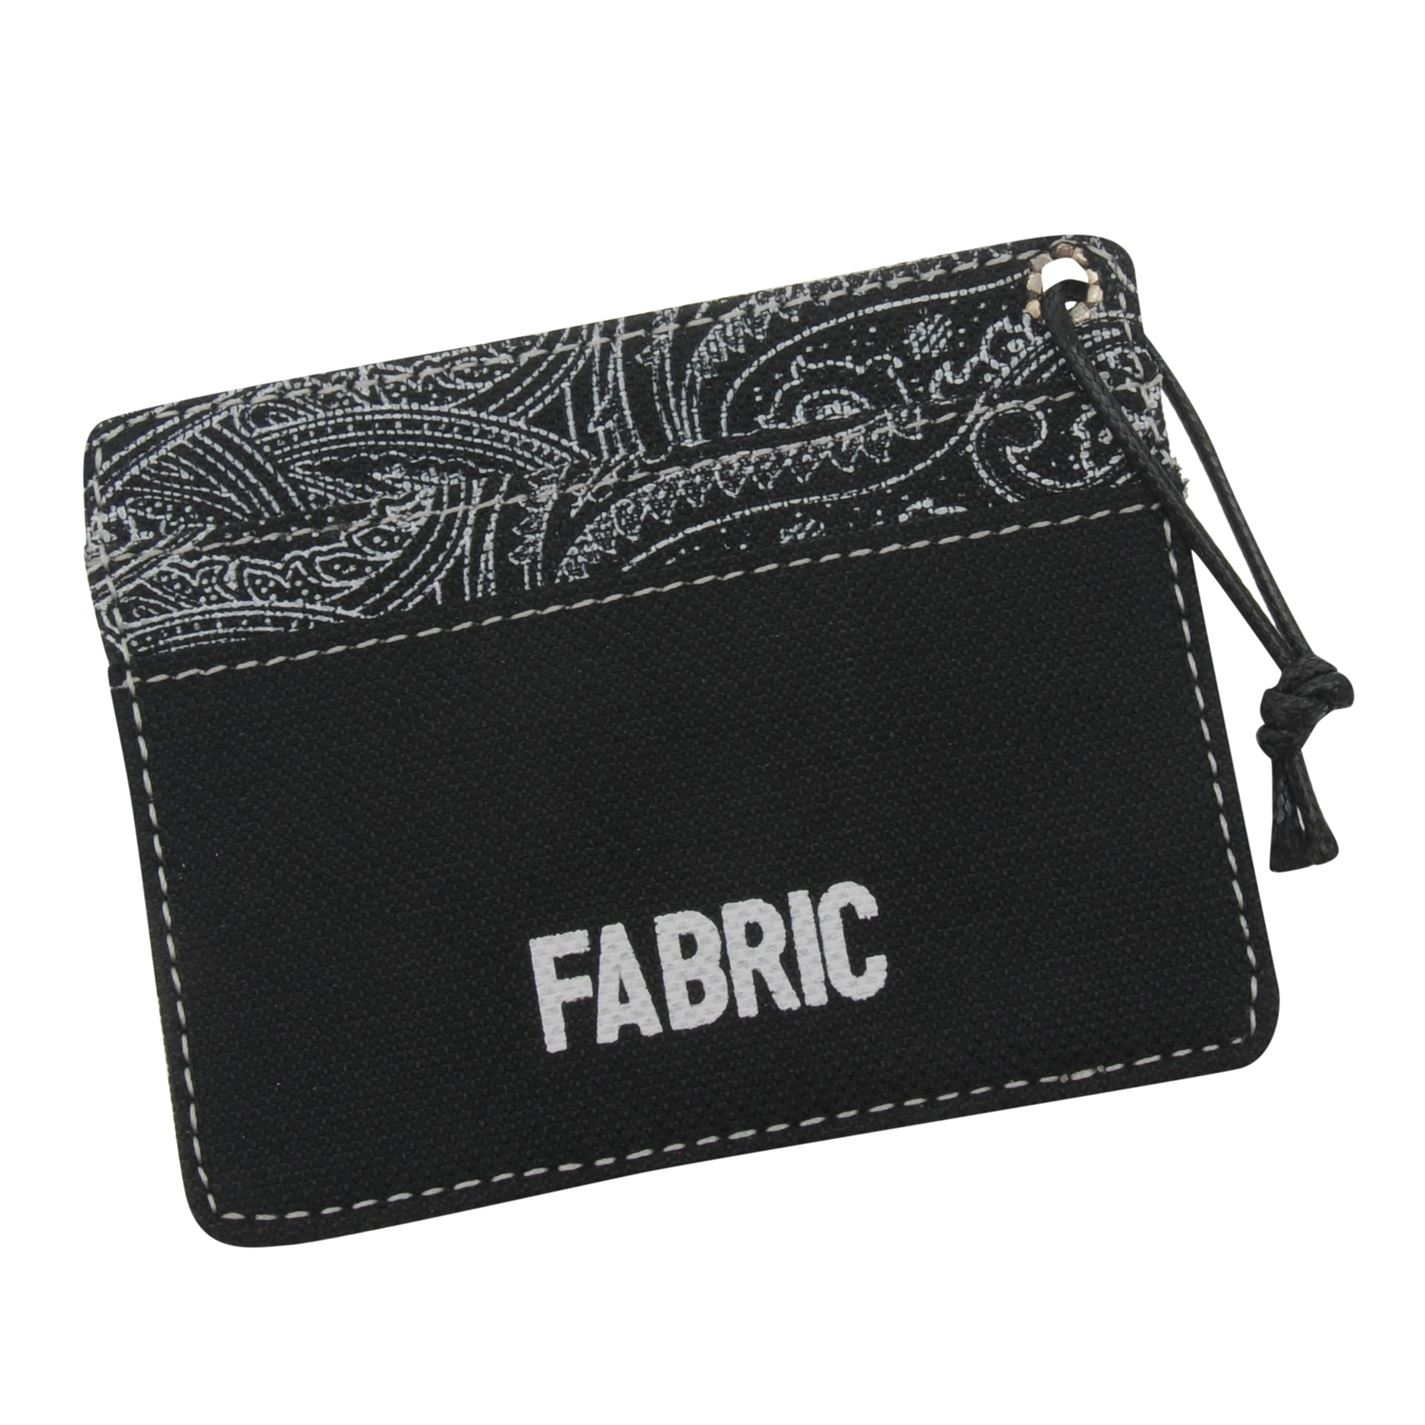 Fabric Pais Card Holder